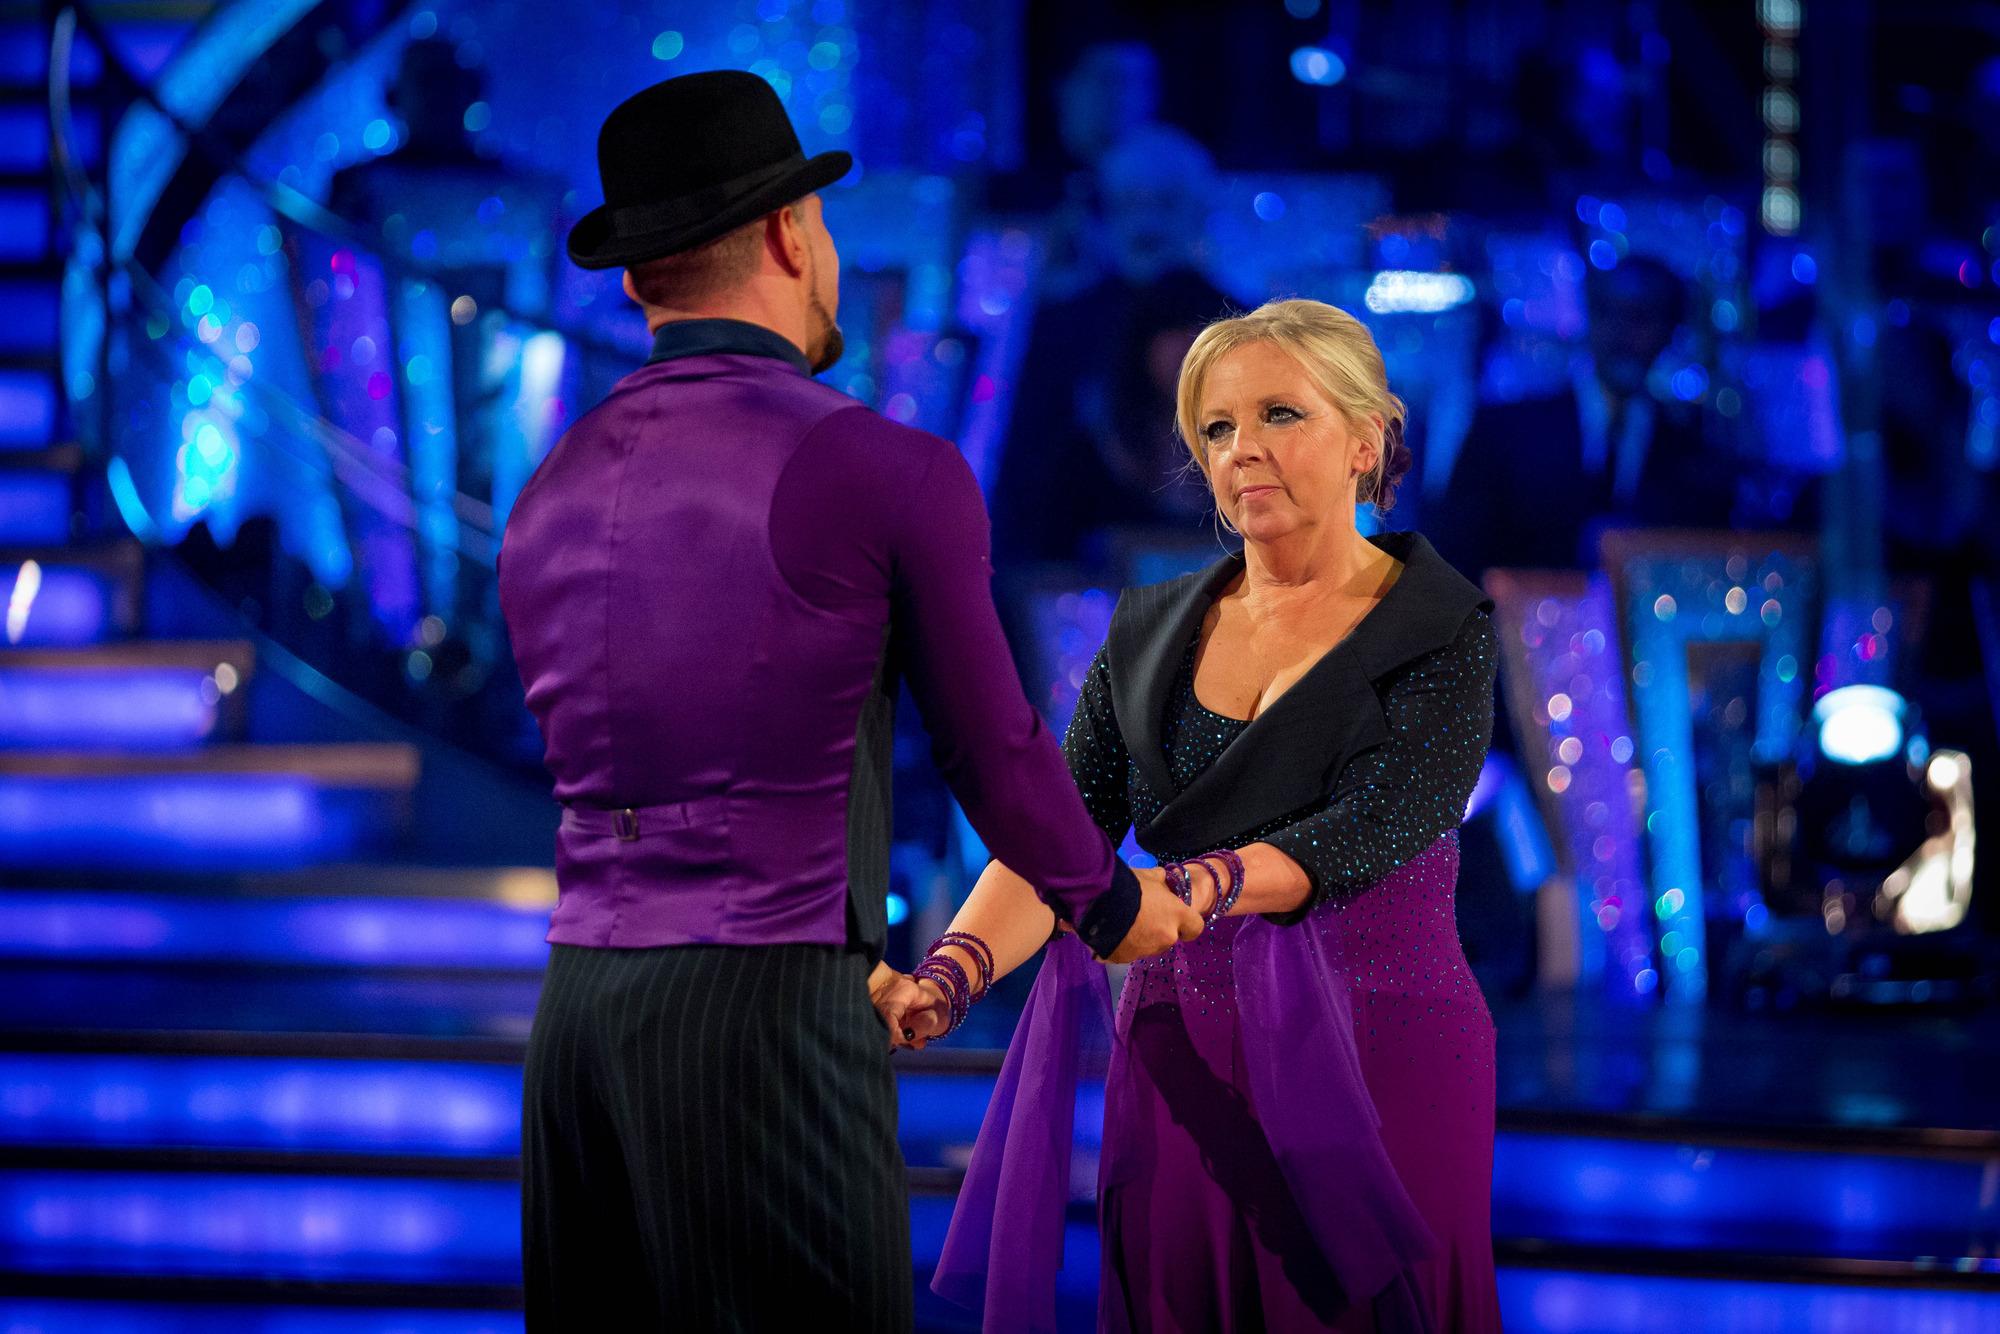 Deborah and Robin leave Strictly Come Dancing Tess Daly, Deborah Meaden, Robin Windsor - (C) BBC - Photographer: Guy Levy